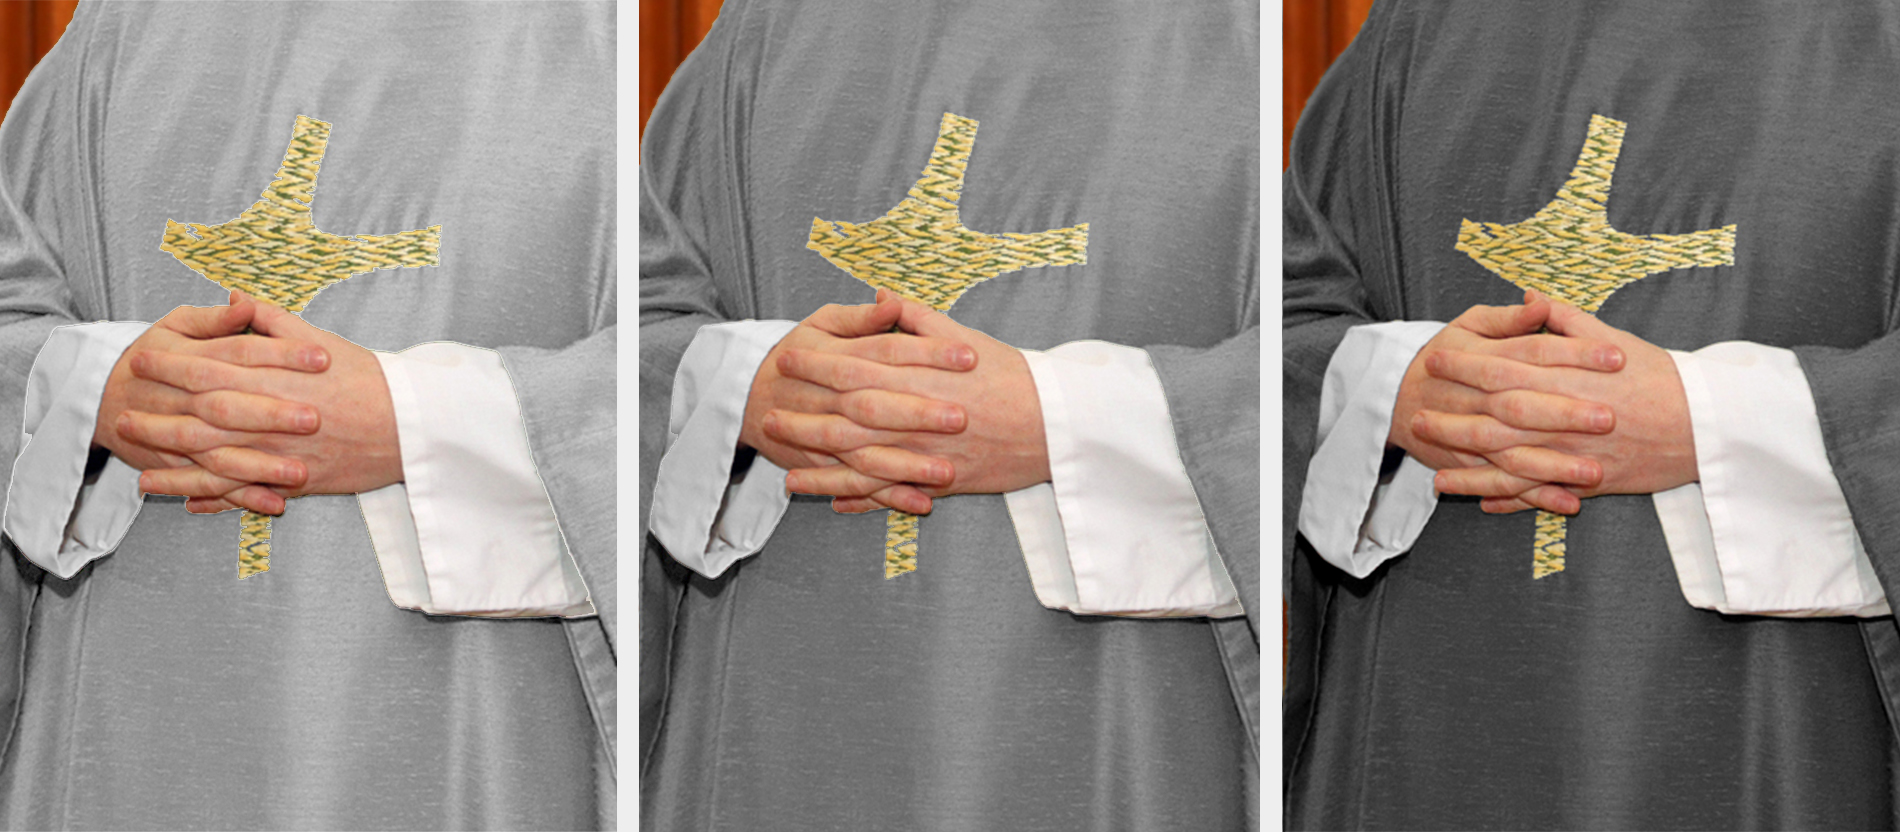 papst plant neue liturgische farbe grau. Black Bedroom Furniture Sets. Home Design Ideas